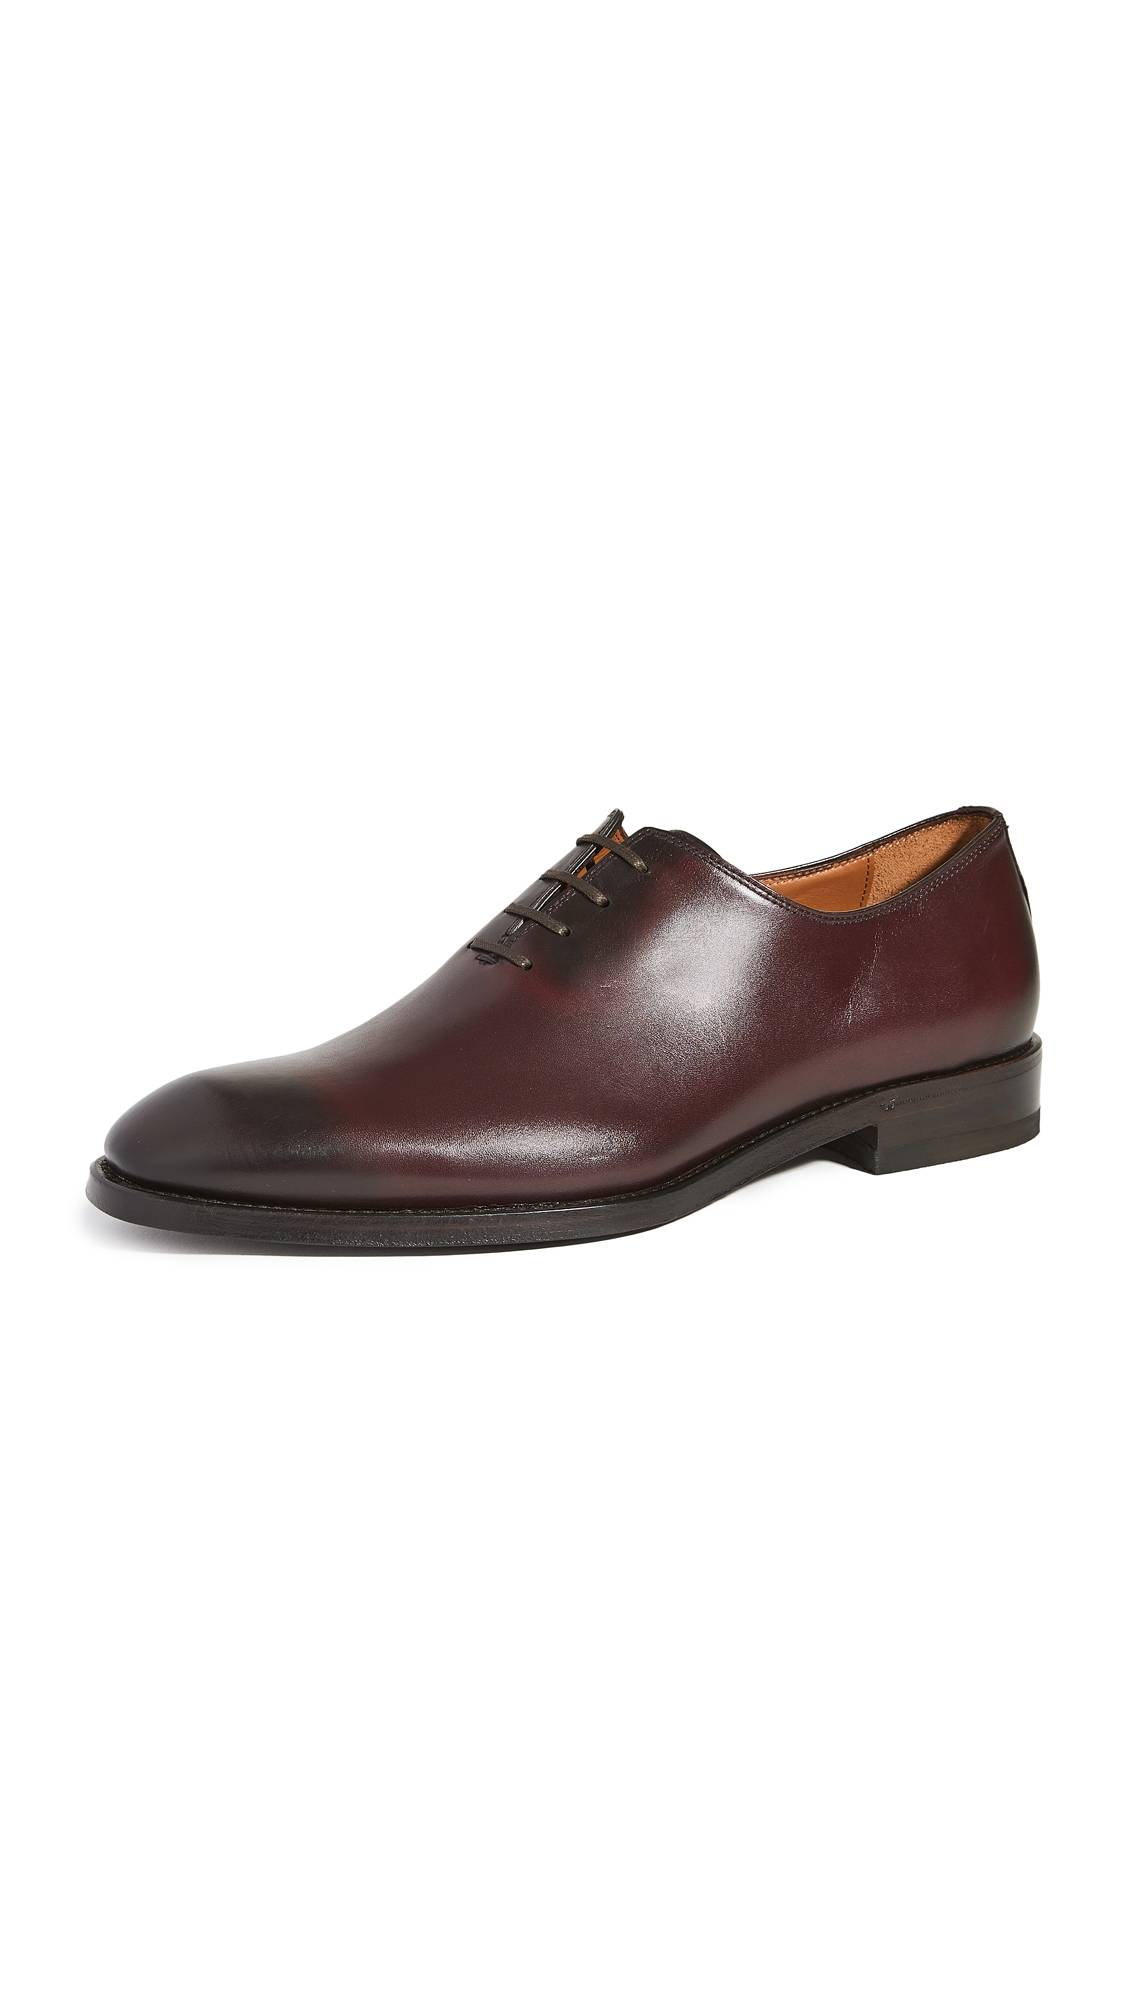 Paul Stuart Lorenzo Lace Up Oxford Shoes - Bordo - Size: 9